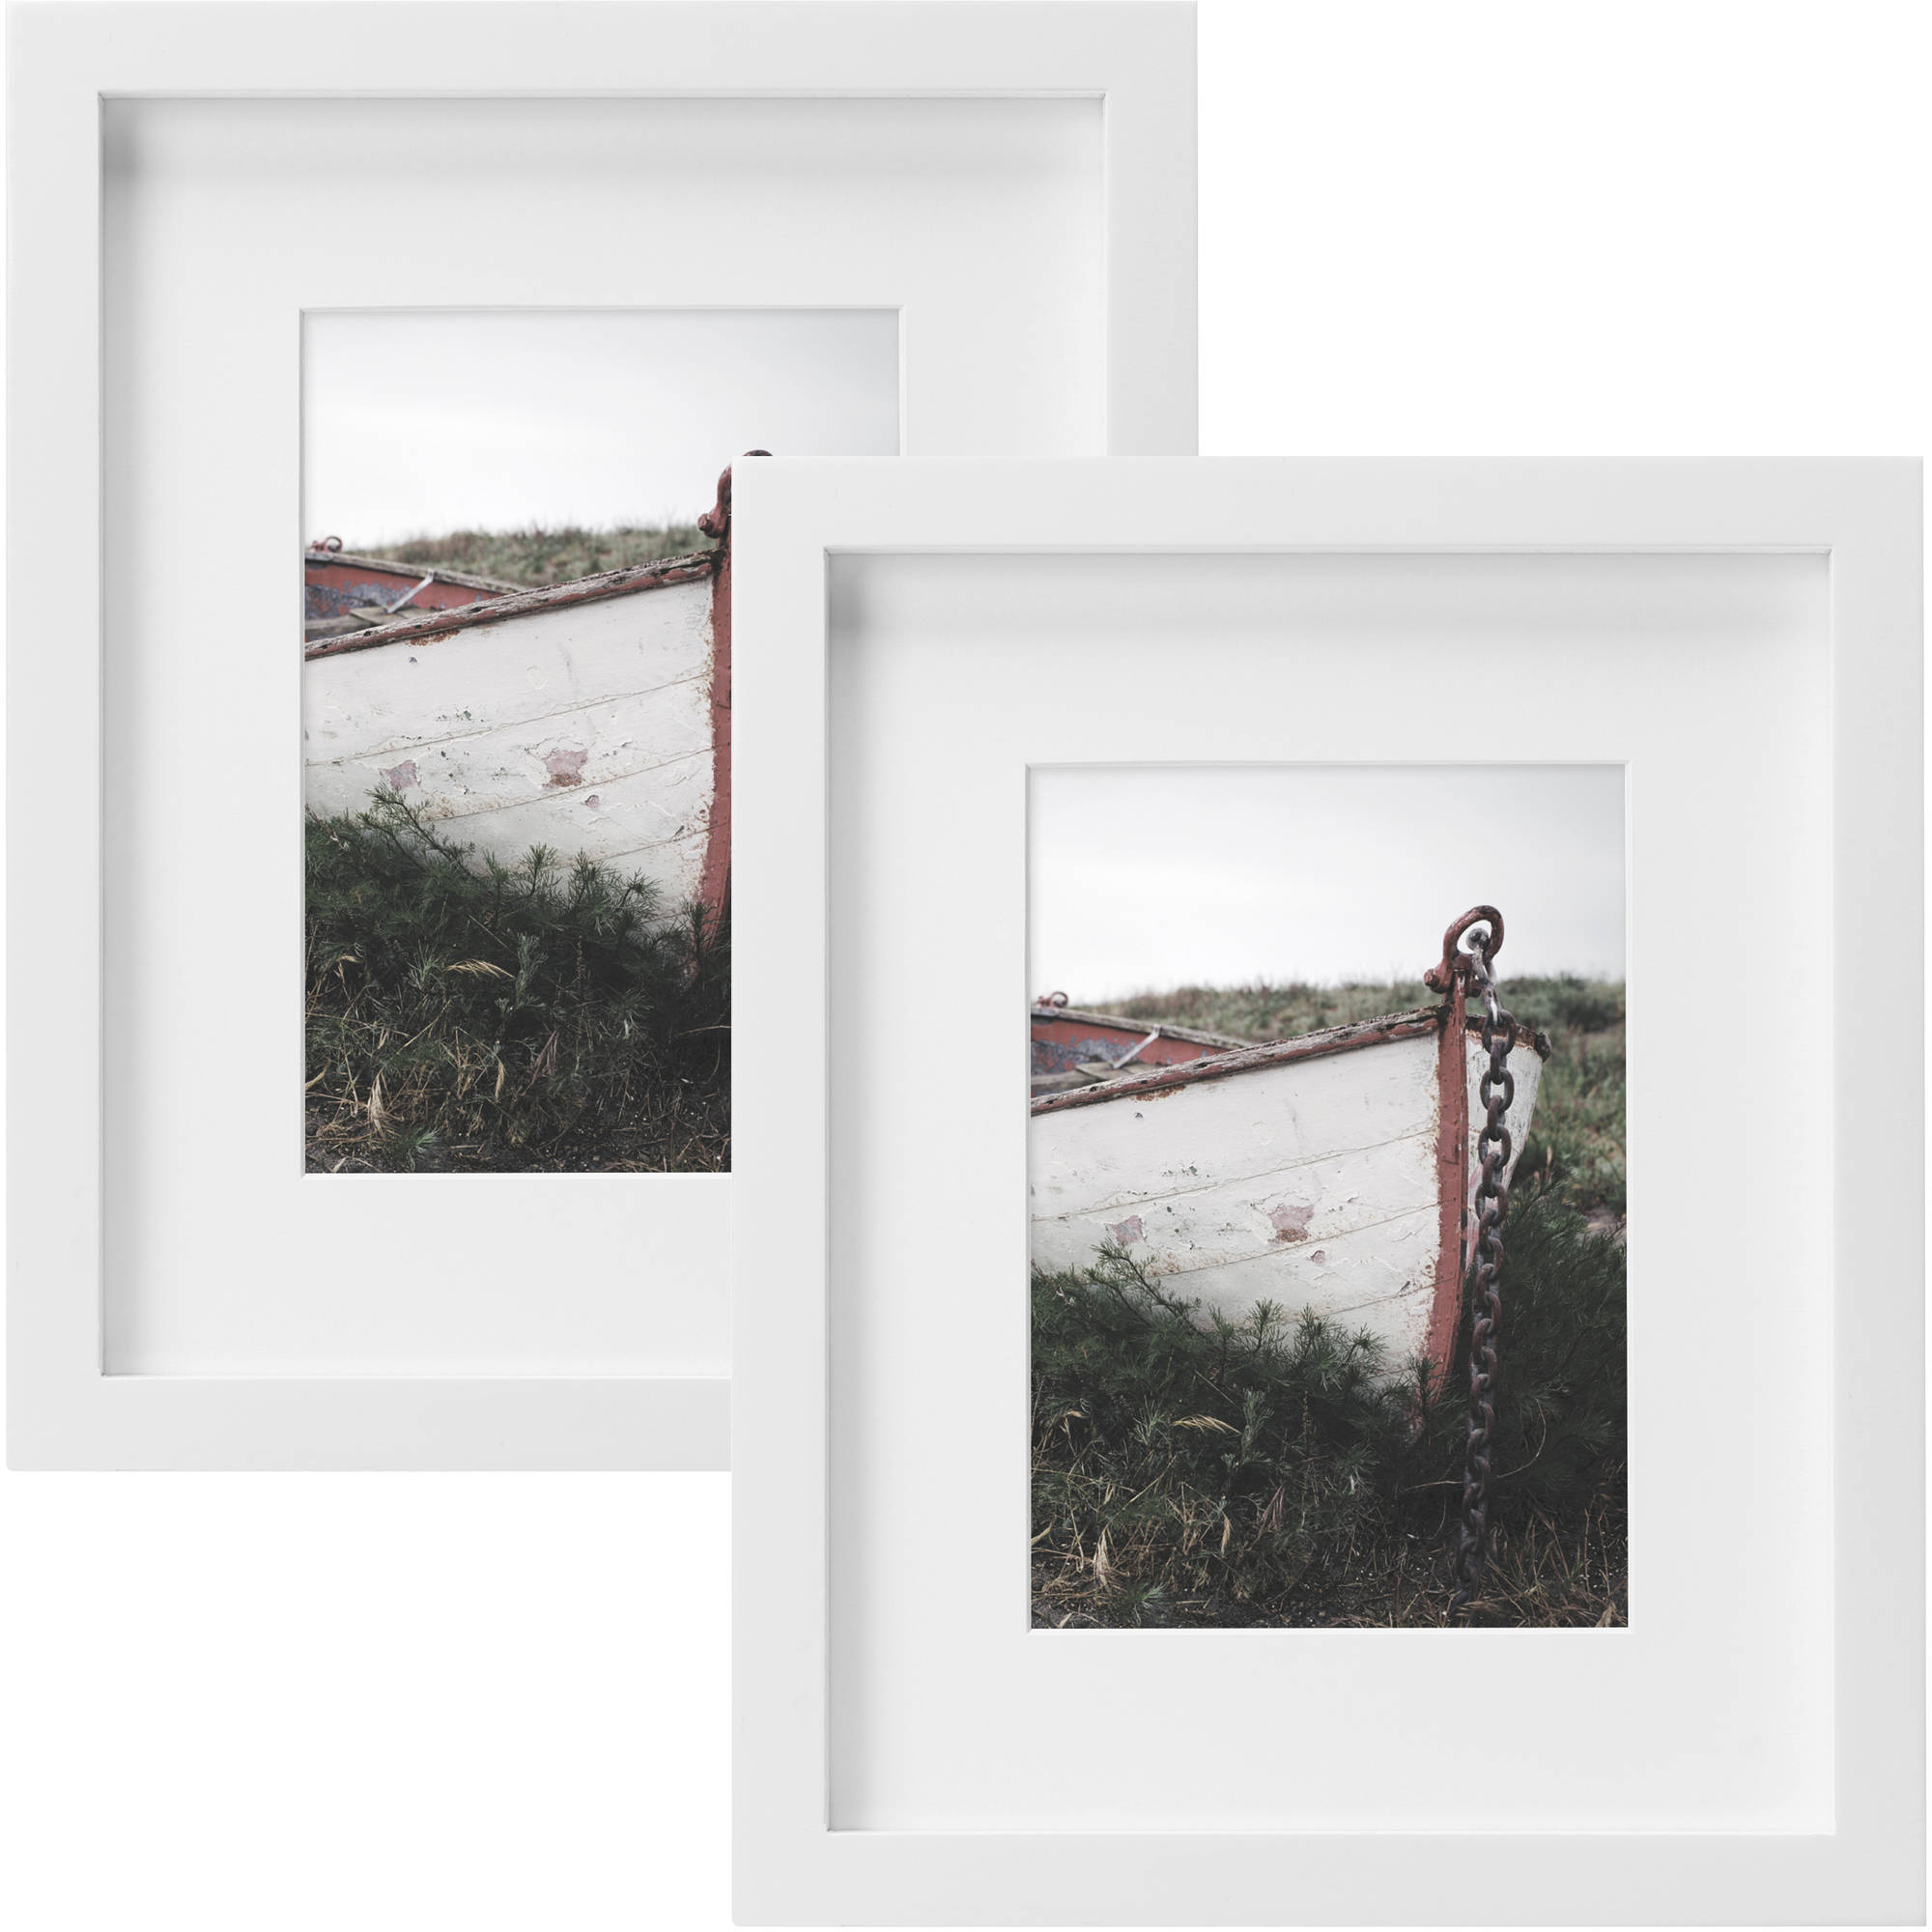 white picture frames 8x10 White Picture Frames